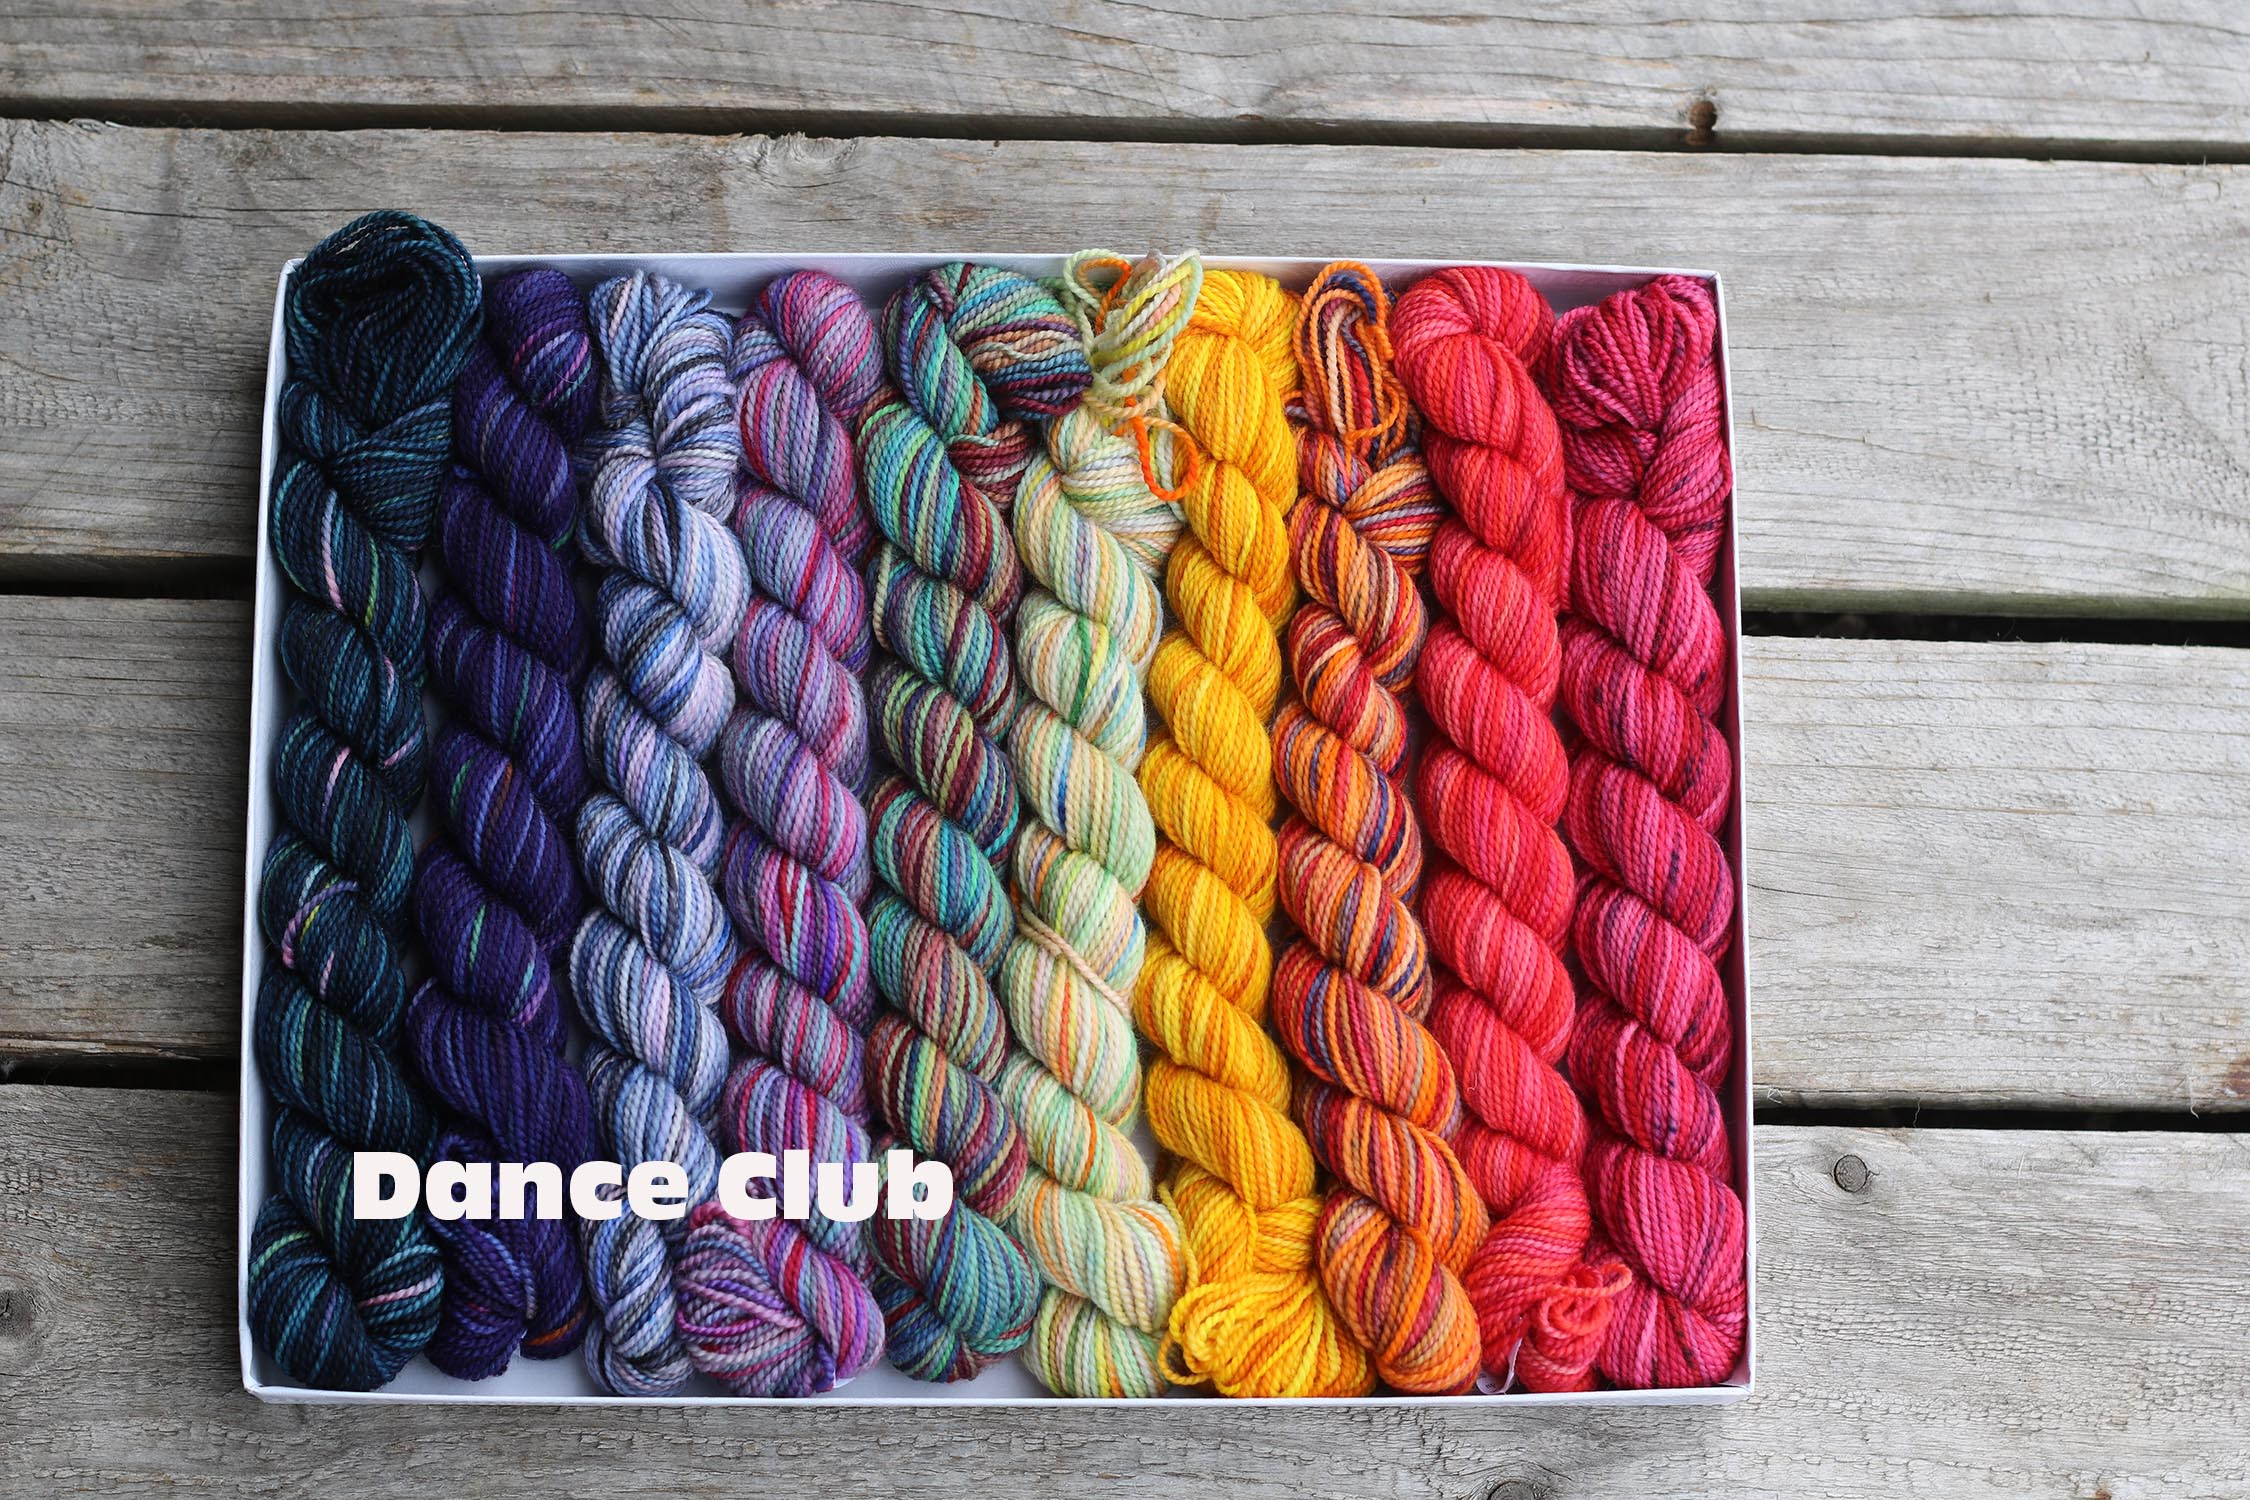 dance club pencil boxIMG_3849.jpg